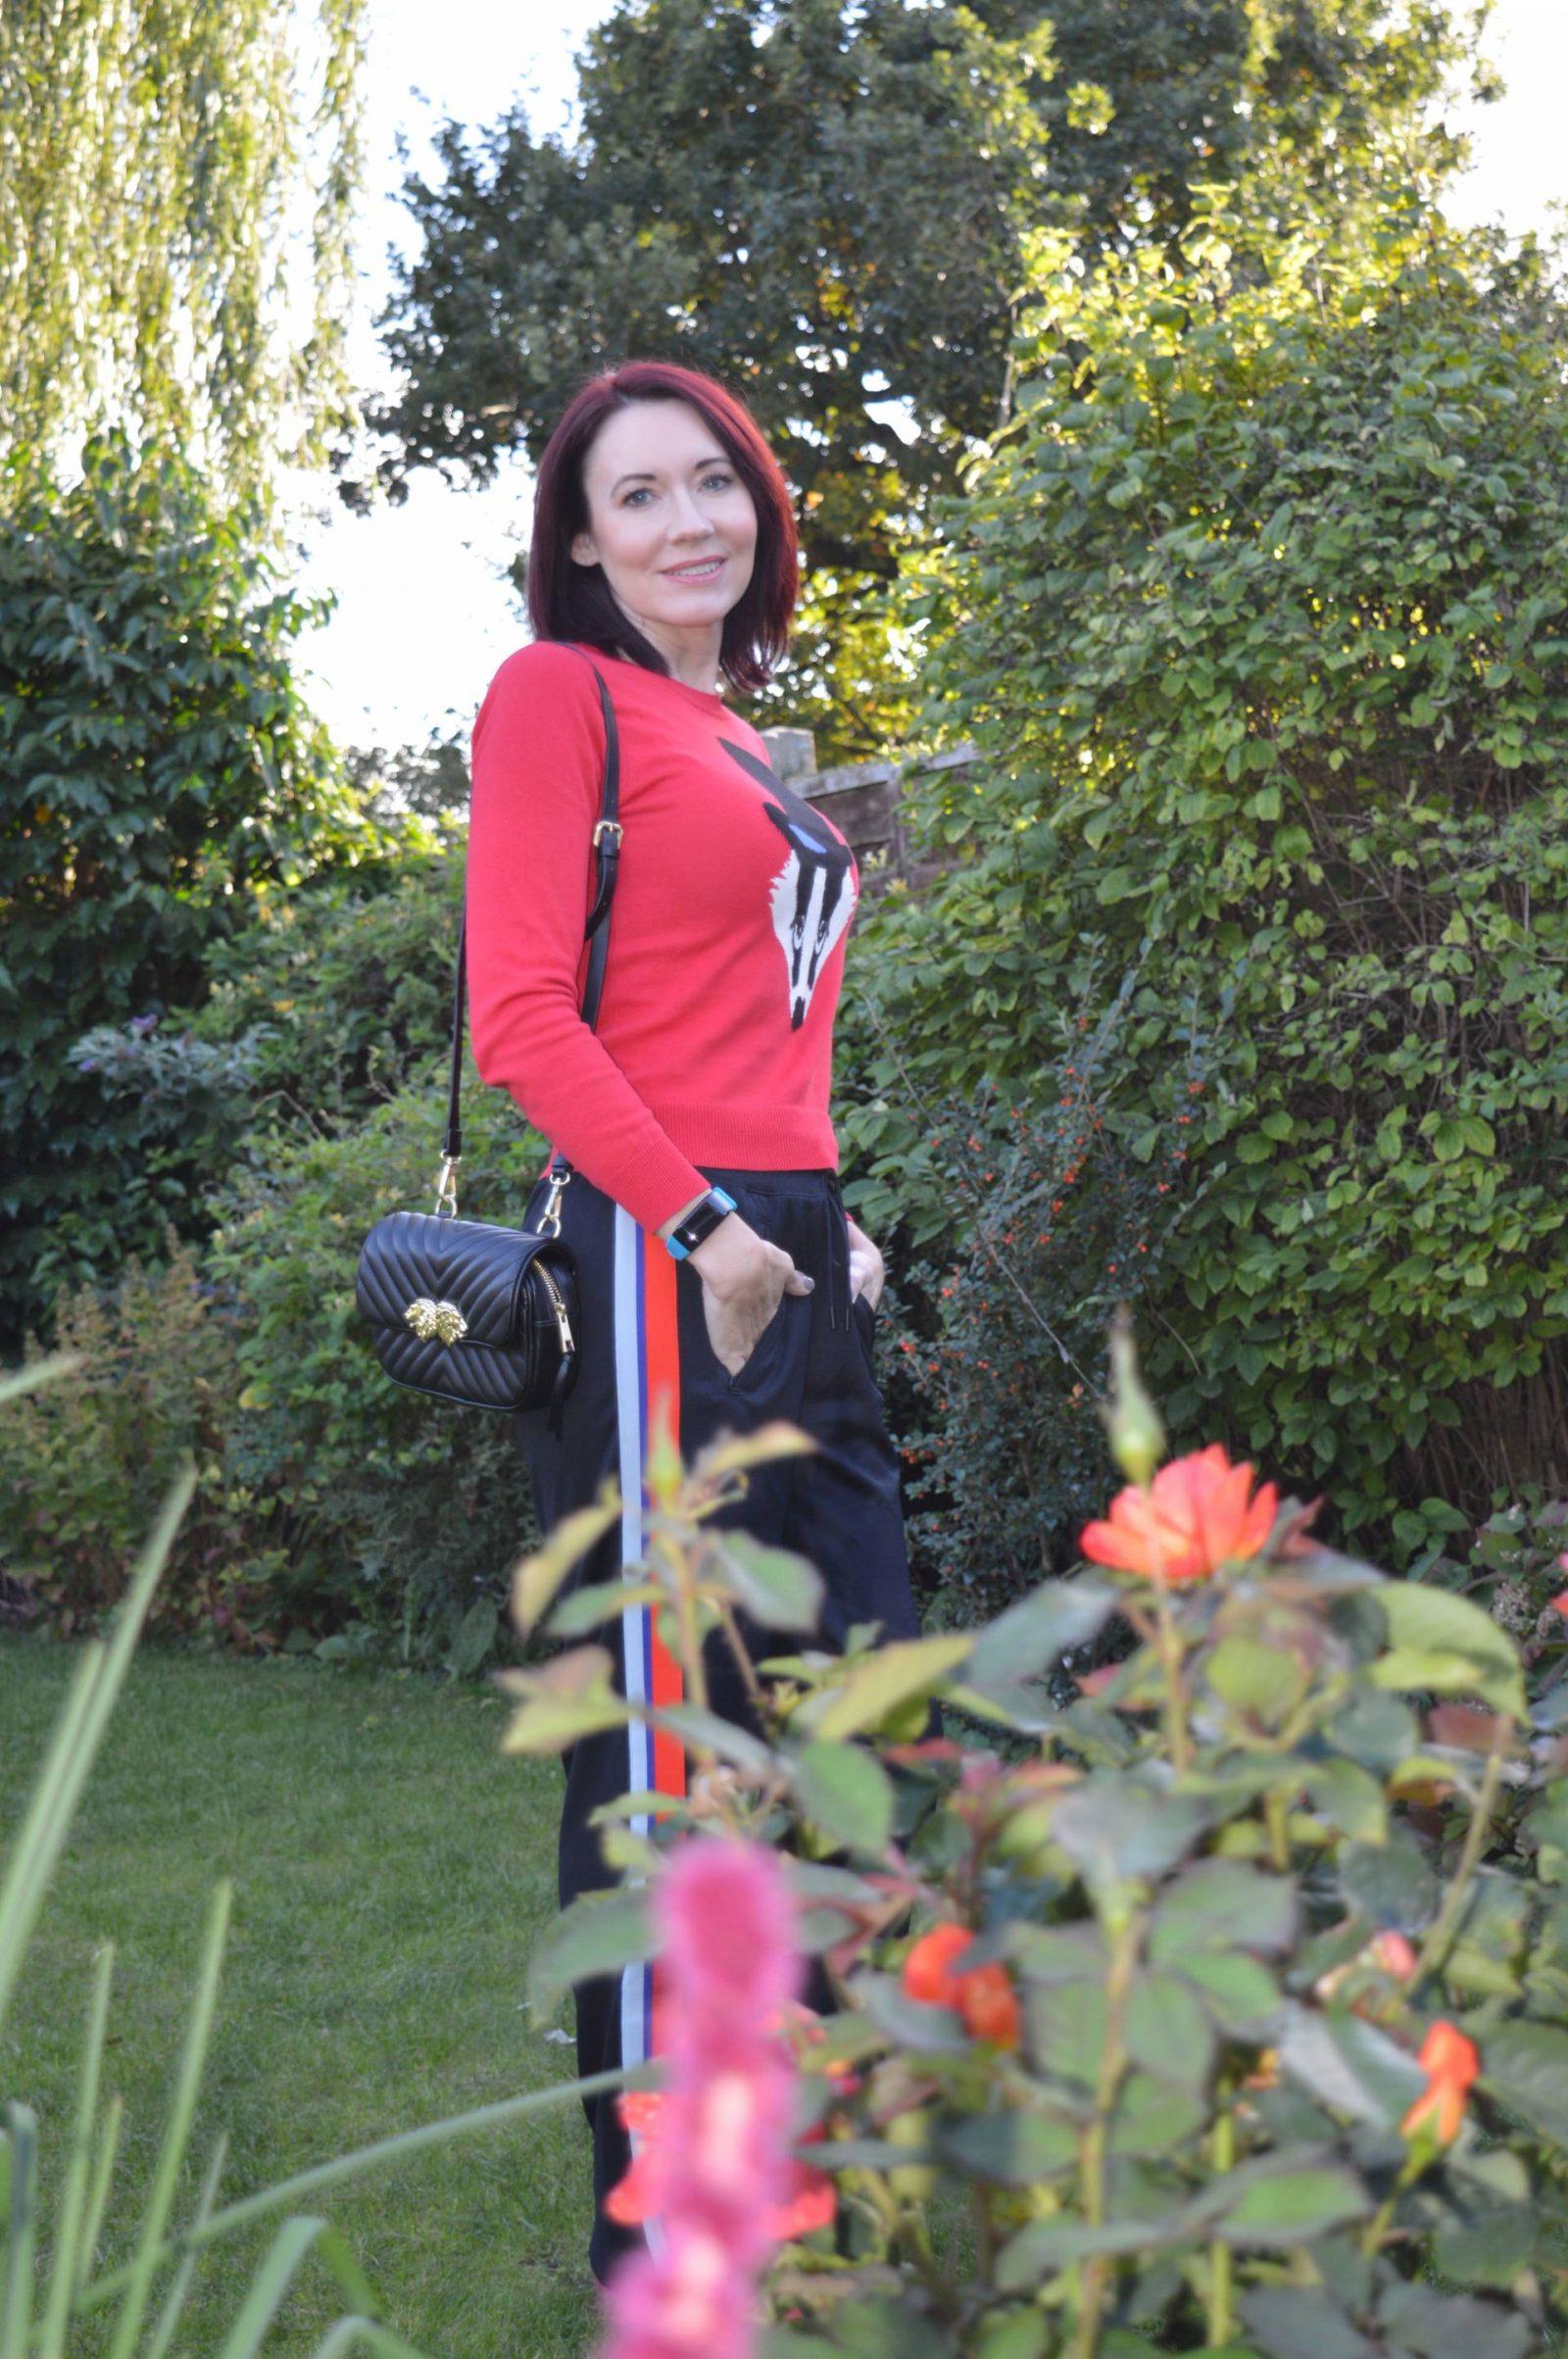 Dressing for comfort in athleisure, black Zara beltbag, badger sweater